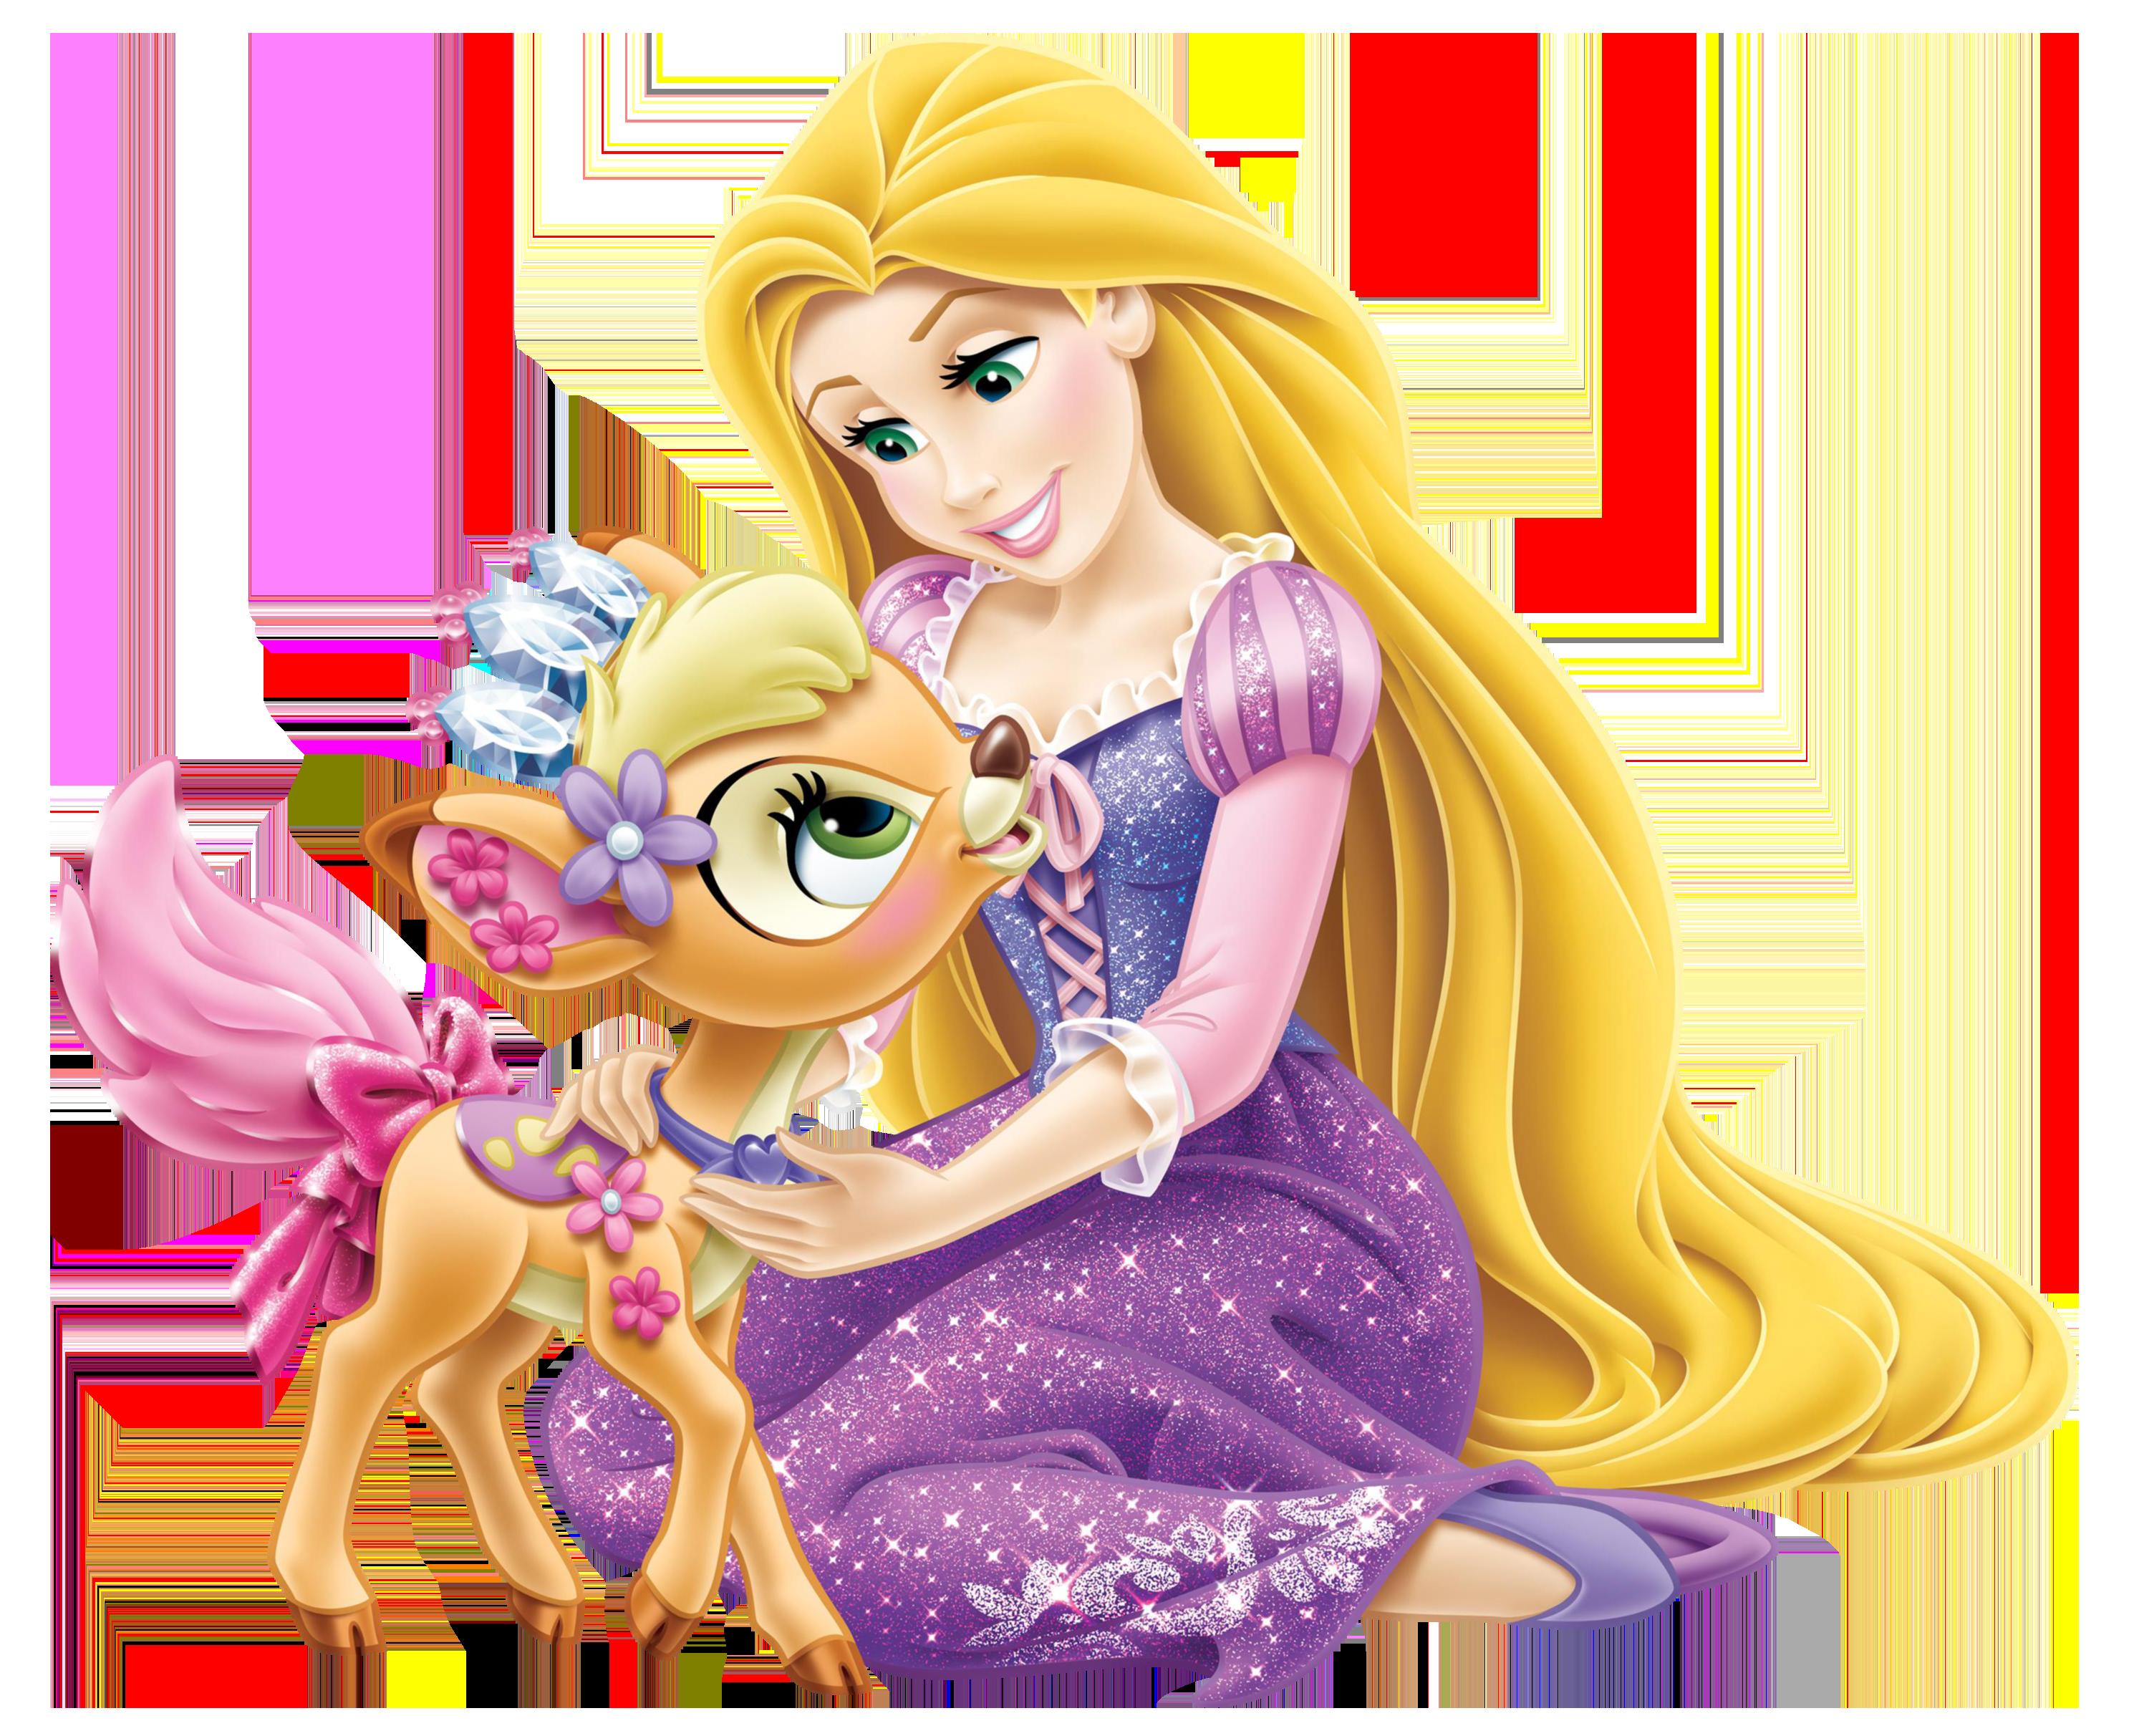 Disney Princess Rapunzel with Little Deer Transparent PNG Clip Art Image - Rapunzel PNG